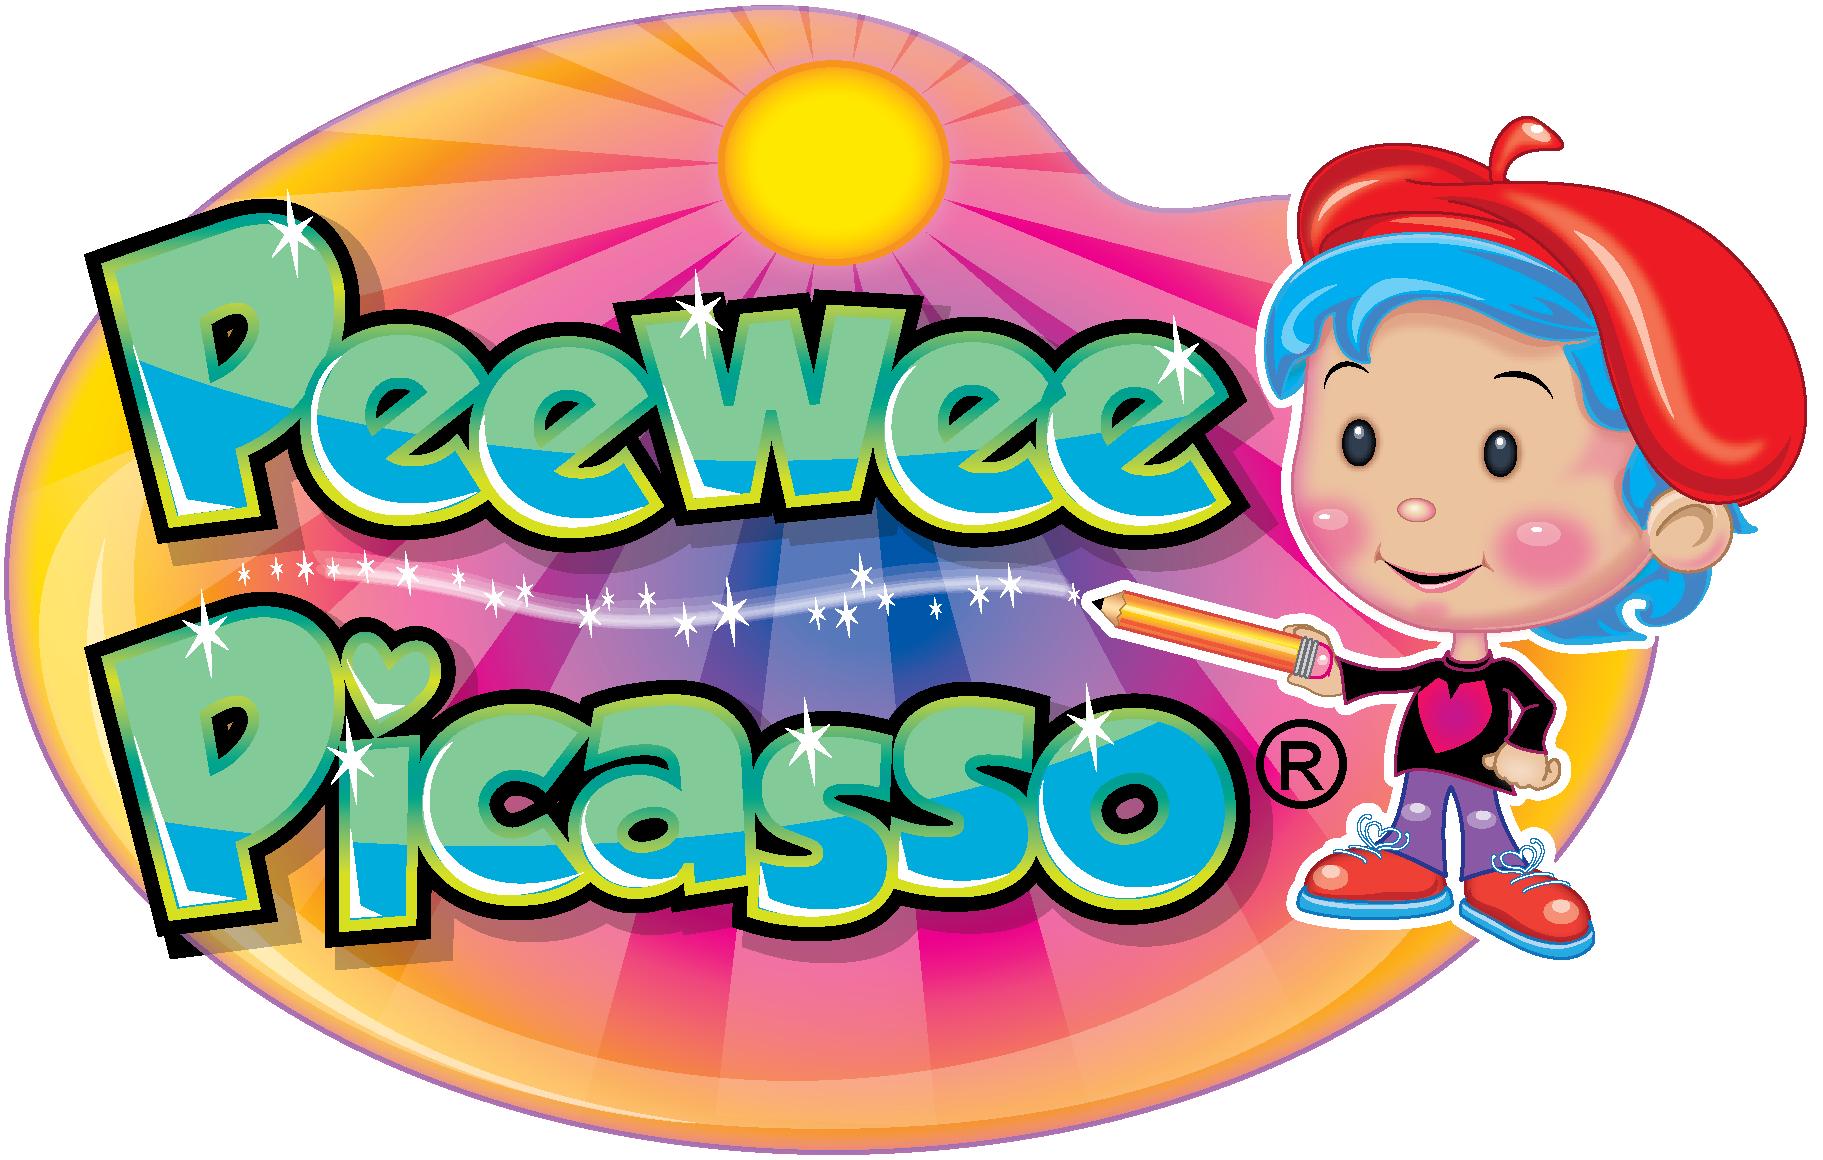 Peewee Picasso logo